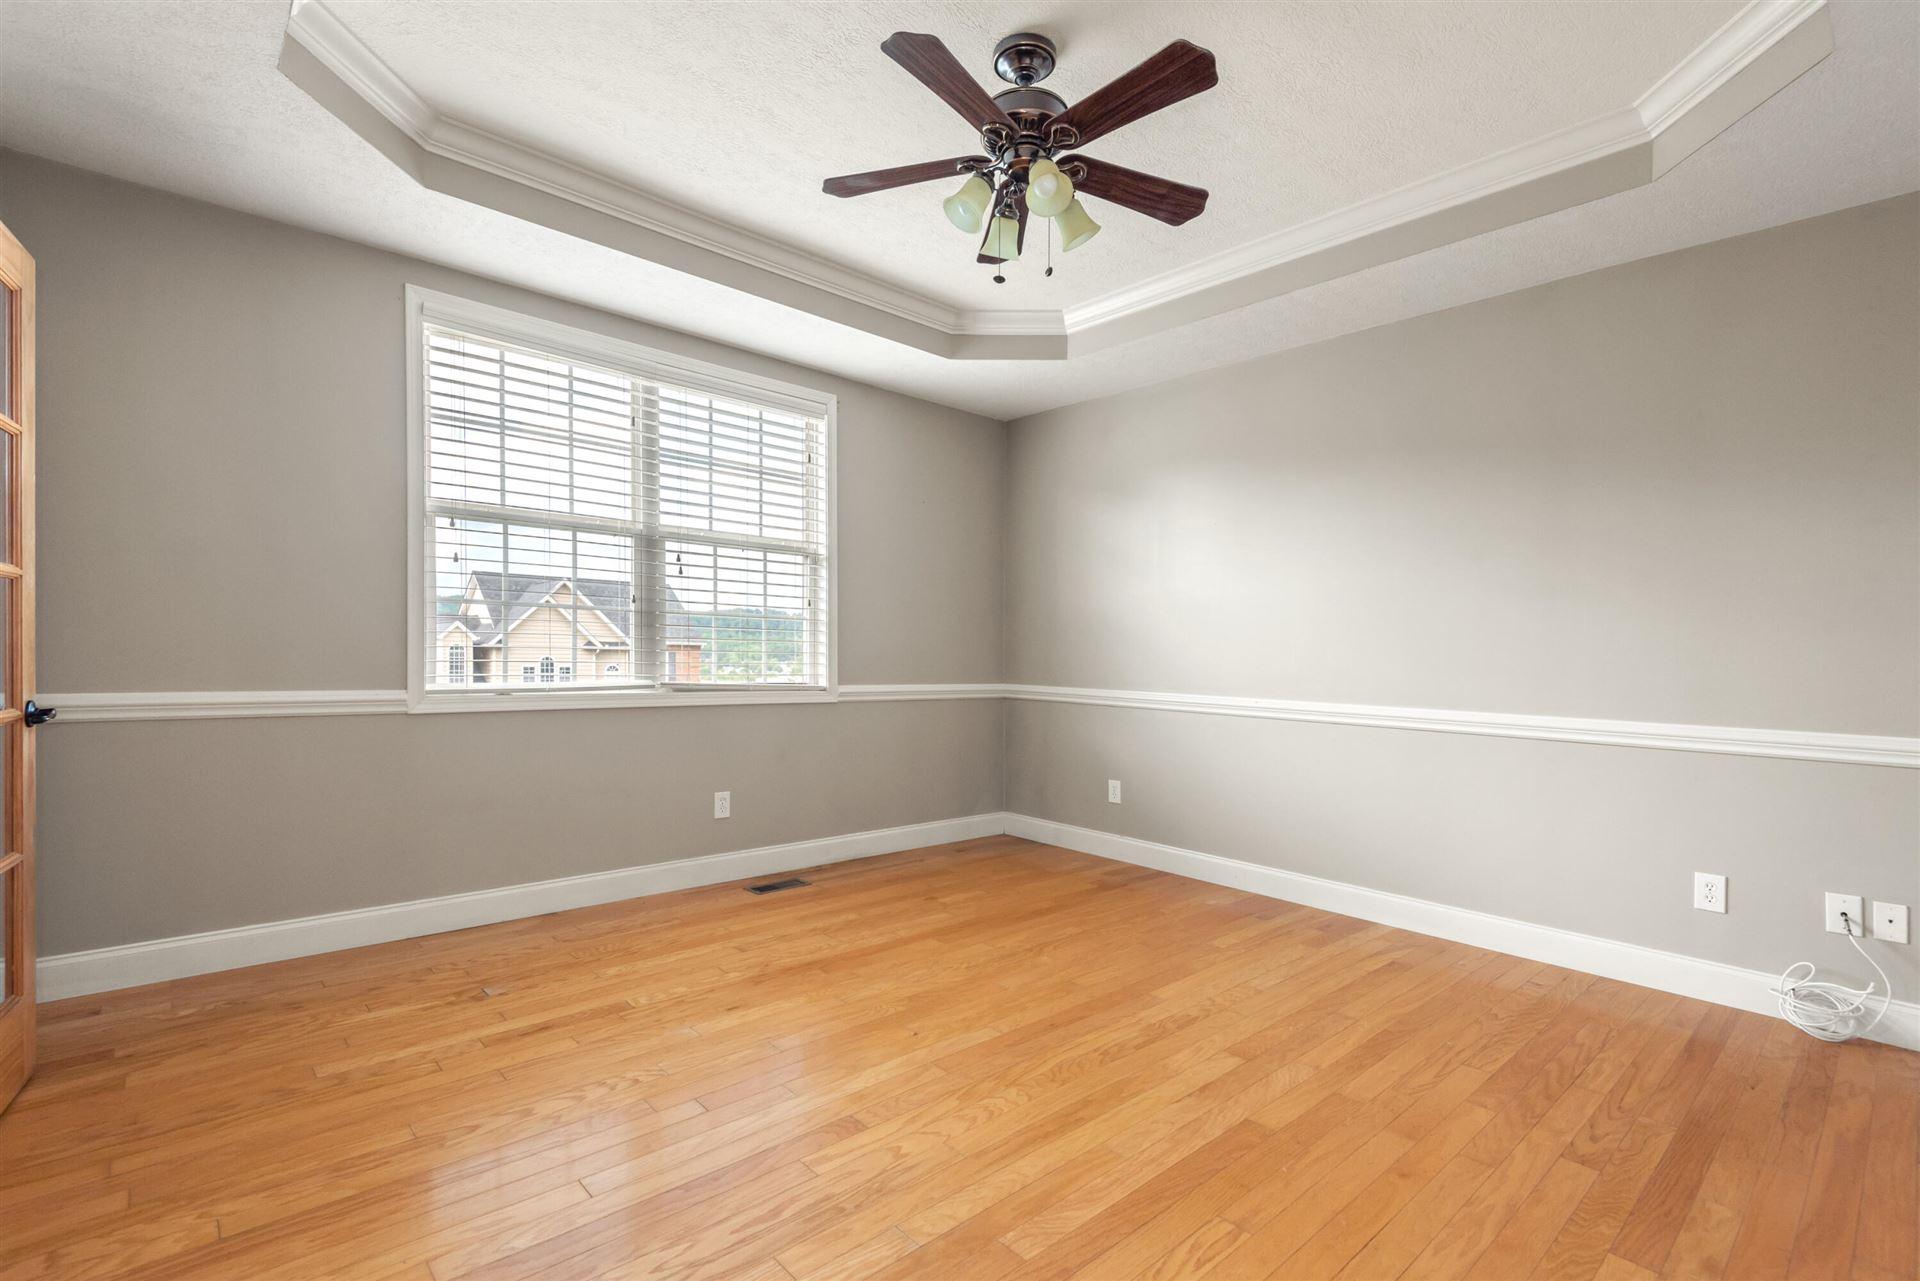 Photo of 612 Calthorpe Lane, Knoxville, TN 37912 (MLS # 1167851)